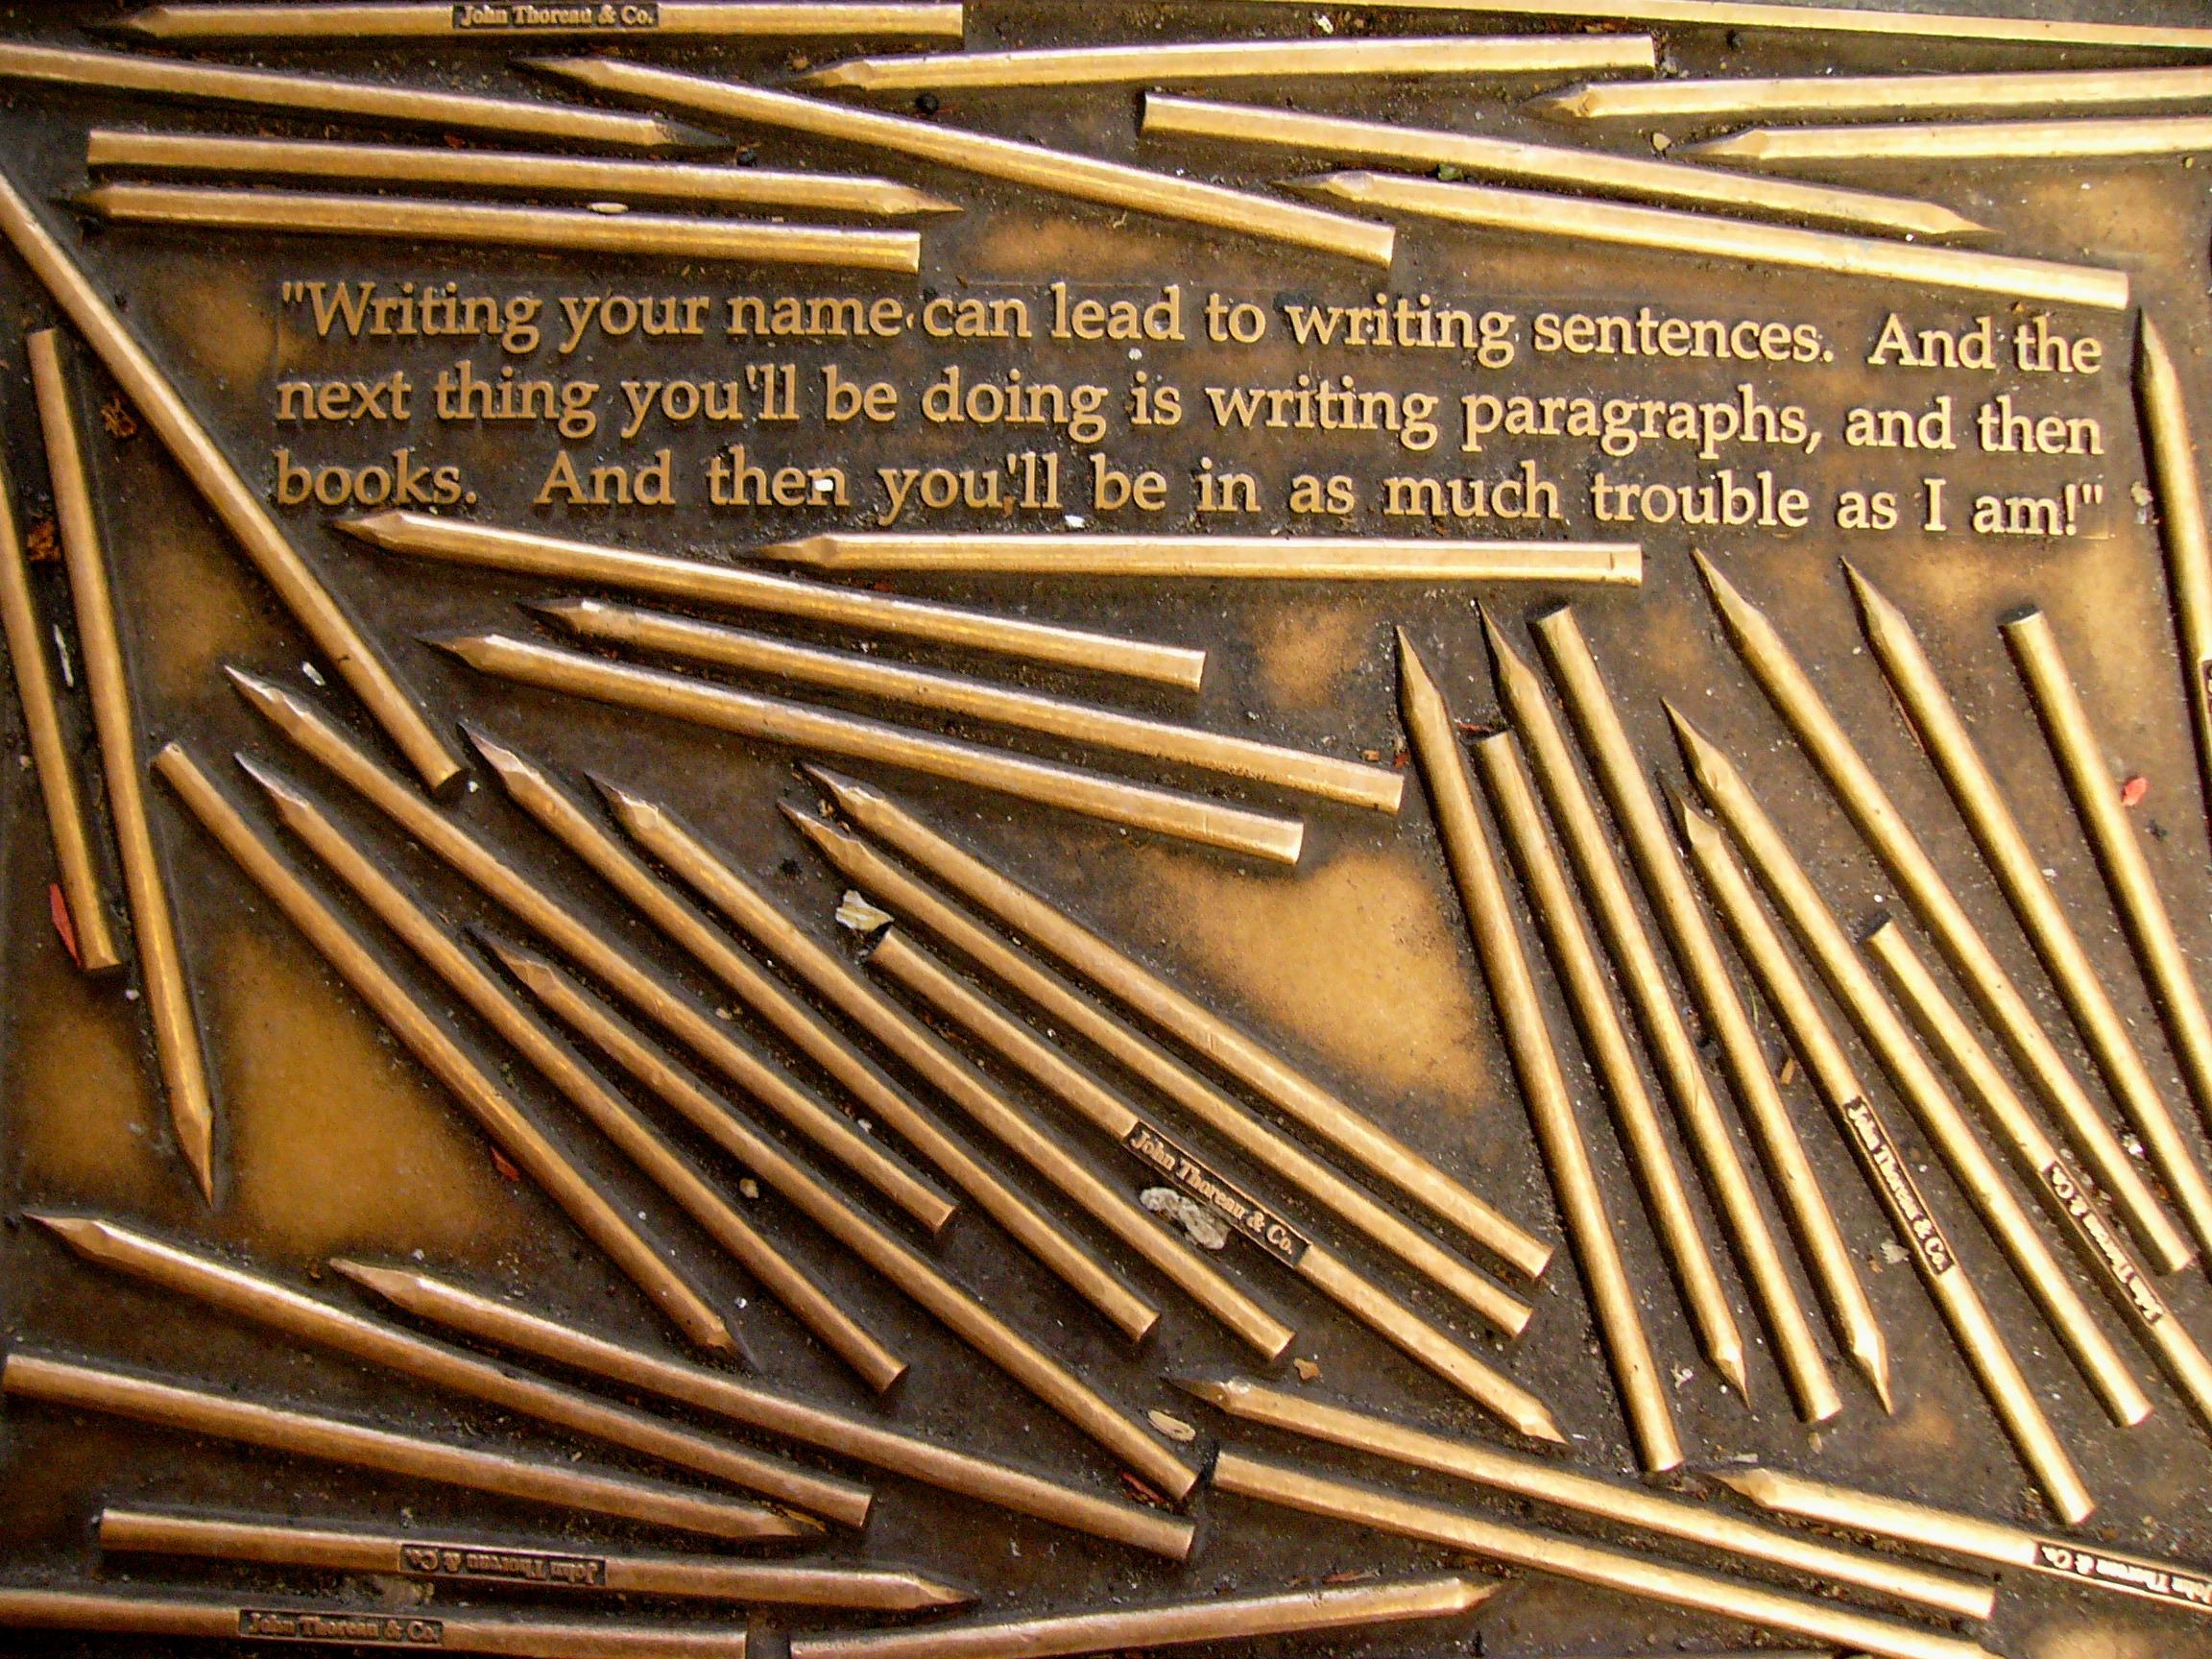 Henry David Thoreau's quote #1